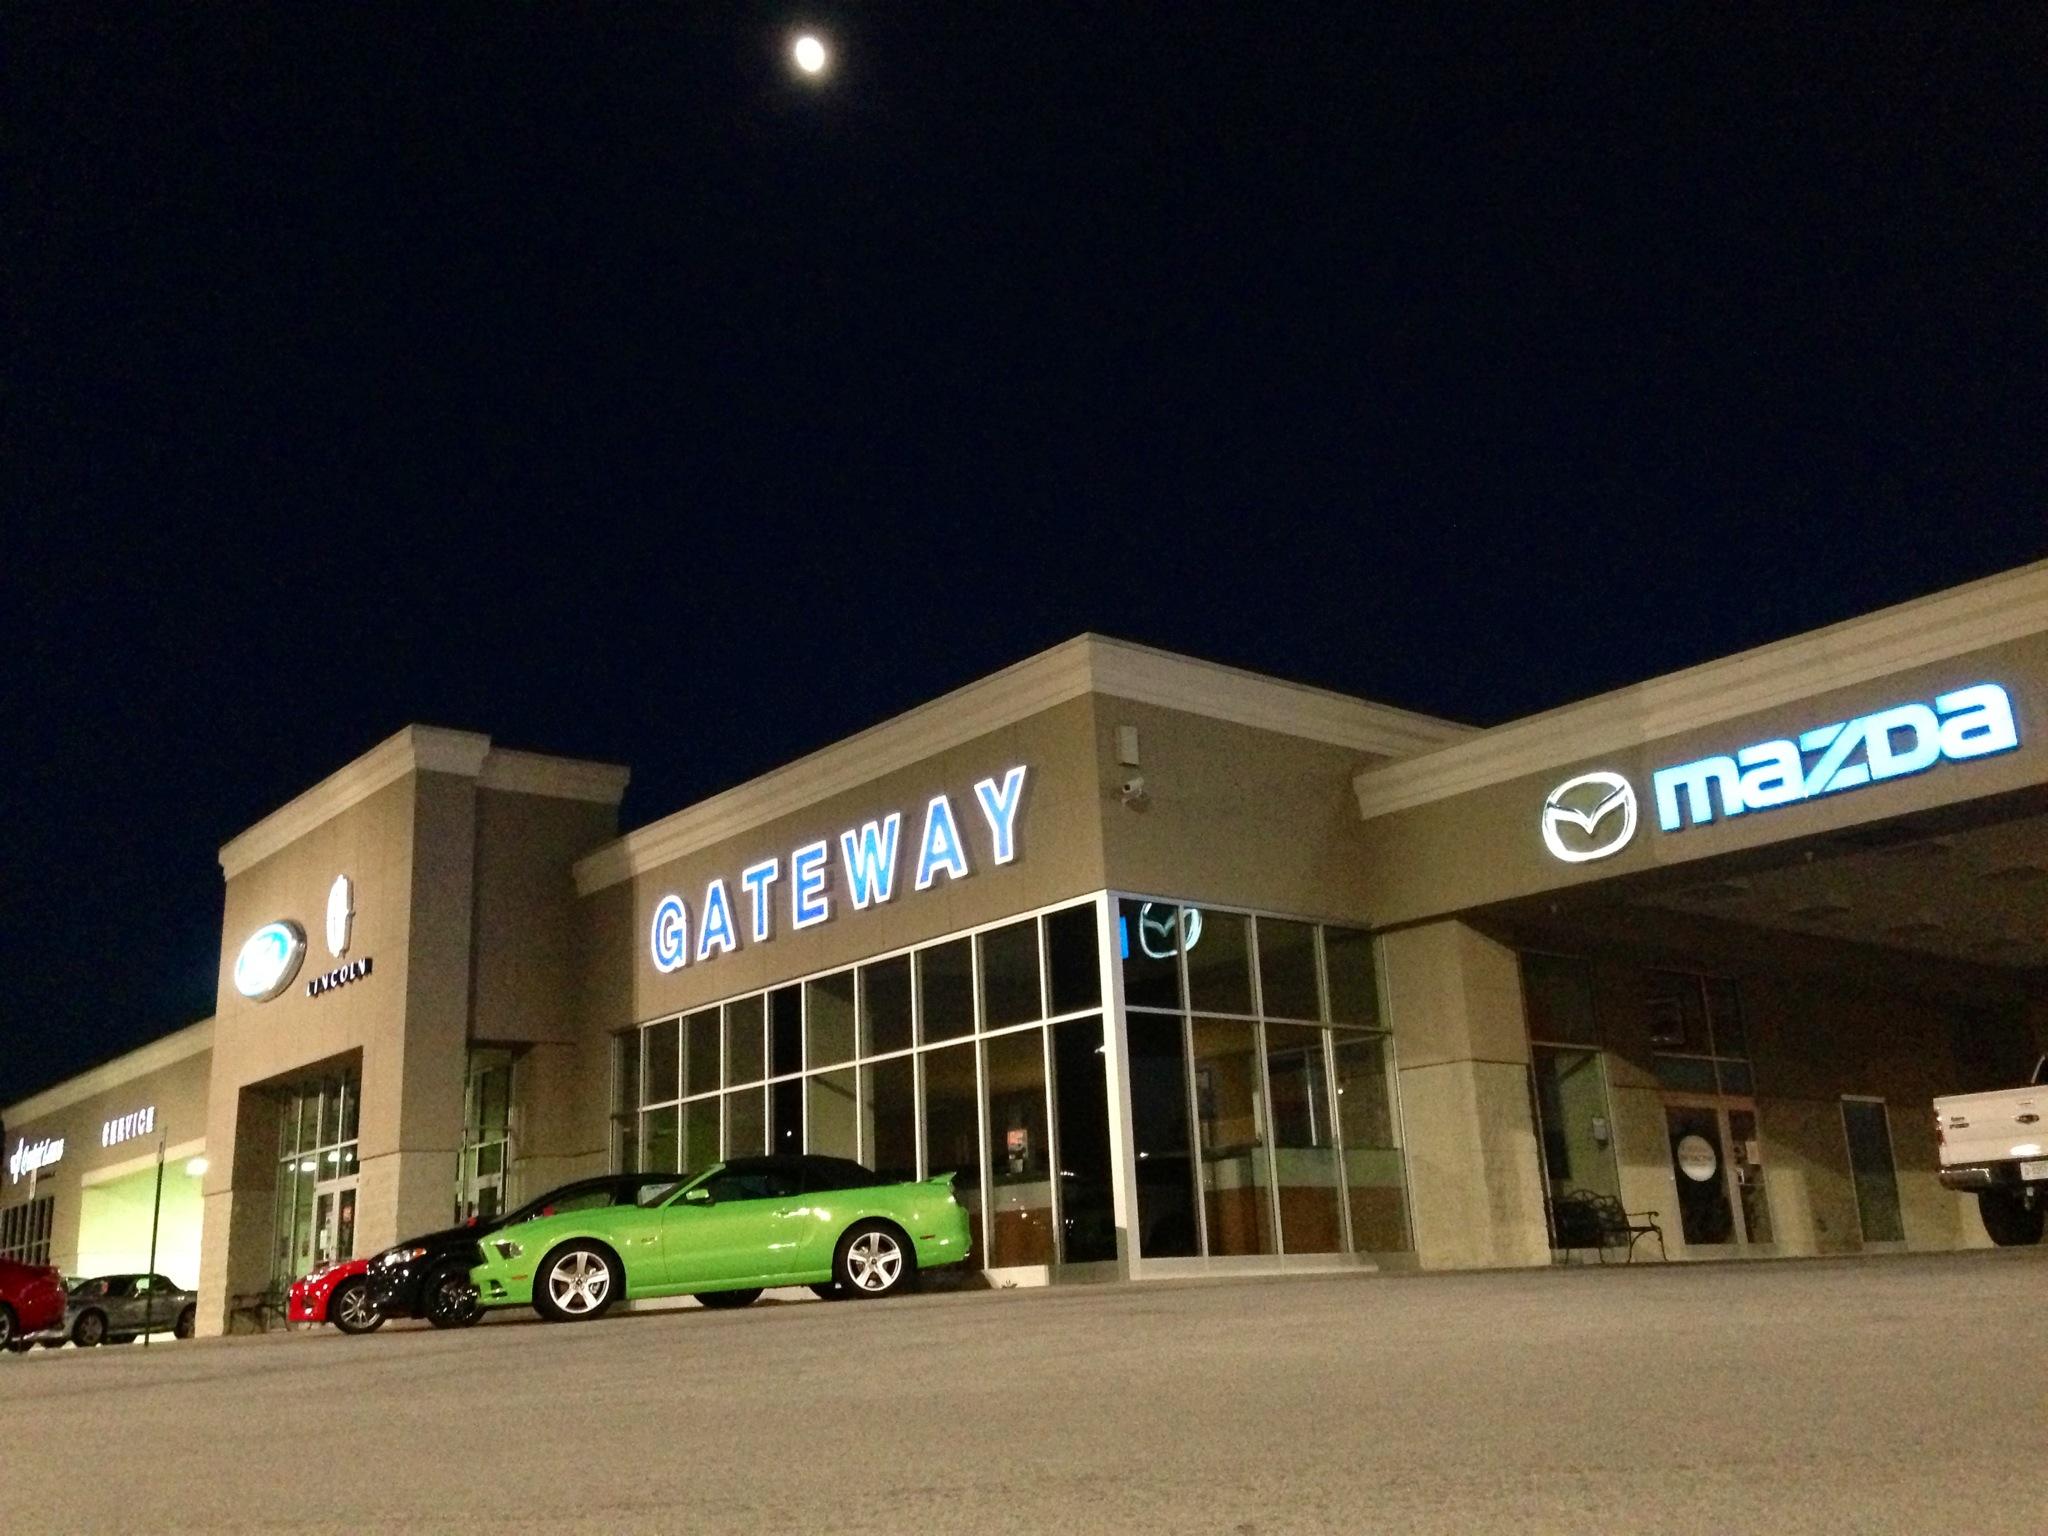 Gateway Ford Lincoln Mazda, Greeneville TN